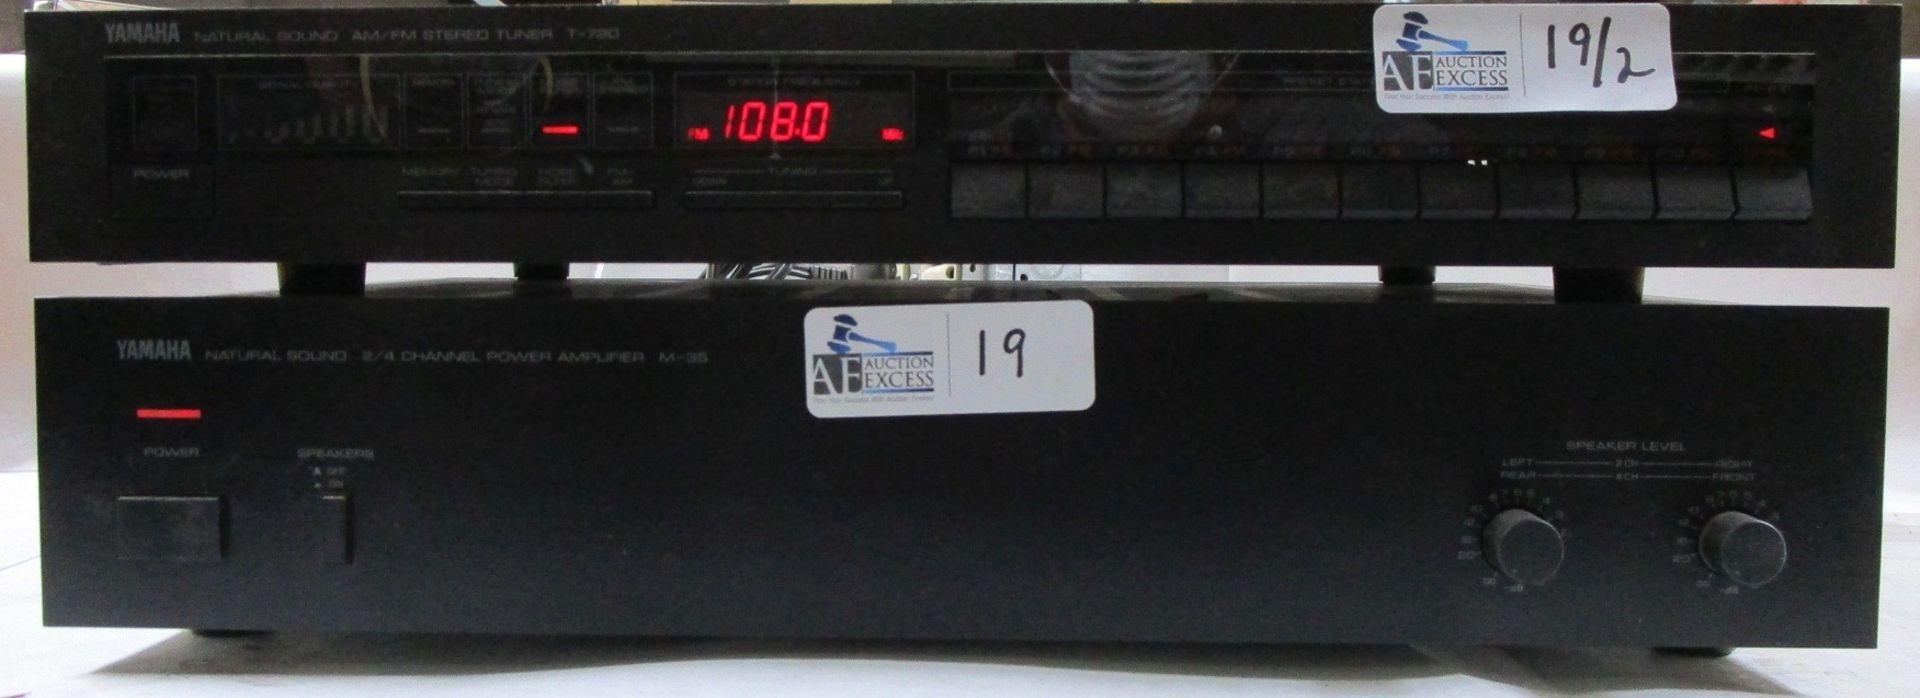 Lot 19 - LOT OF 2 YAMAHA ELECTRONICS